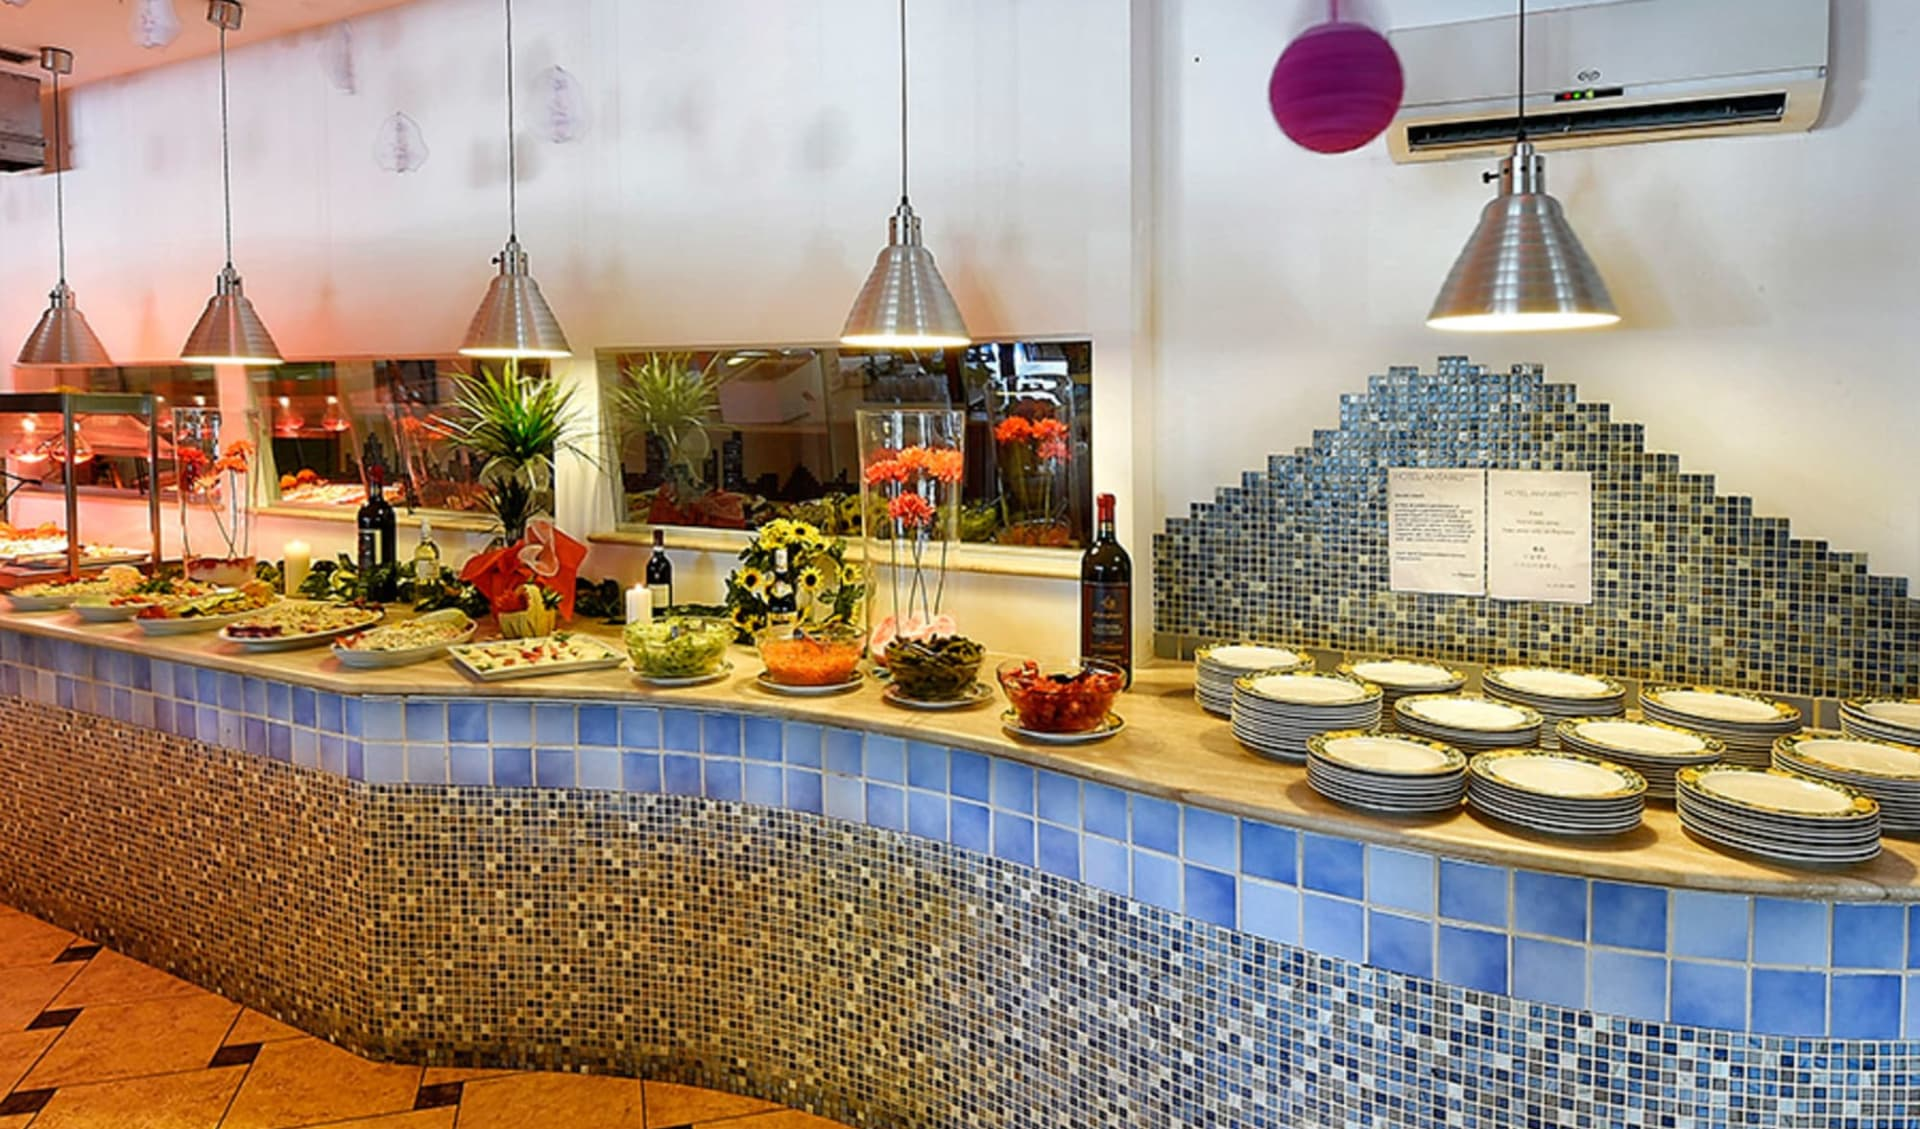 Gardasee - Hotel Antares: Antares Buffet